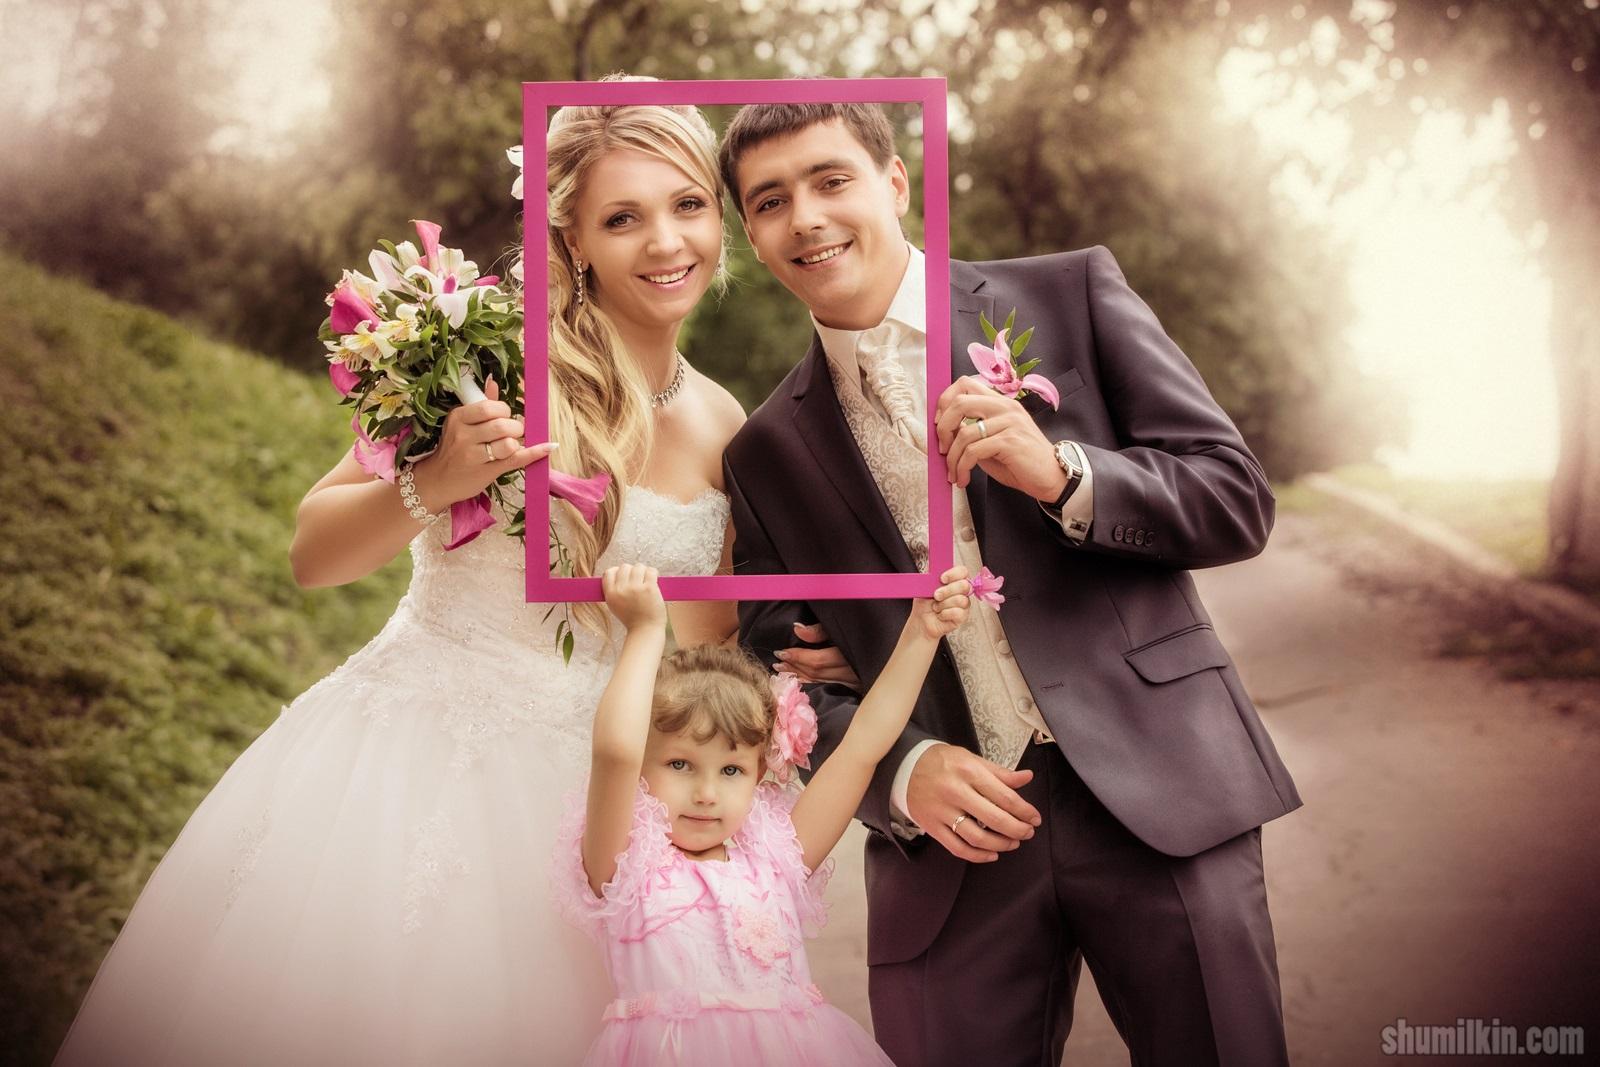 Заказать фото и видеосъемки на свадьбу